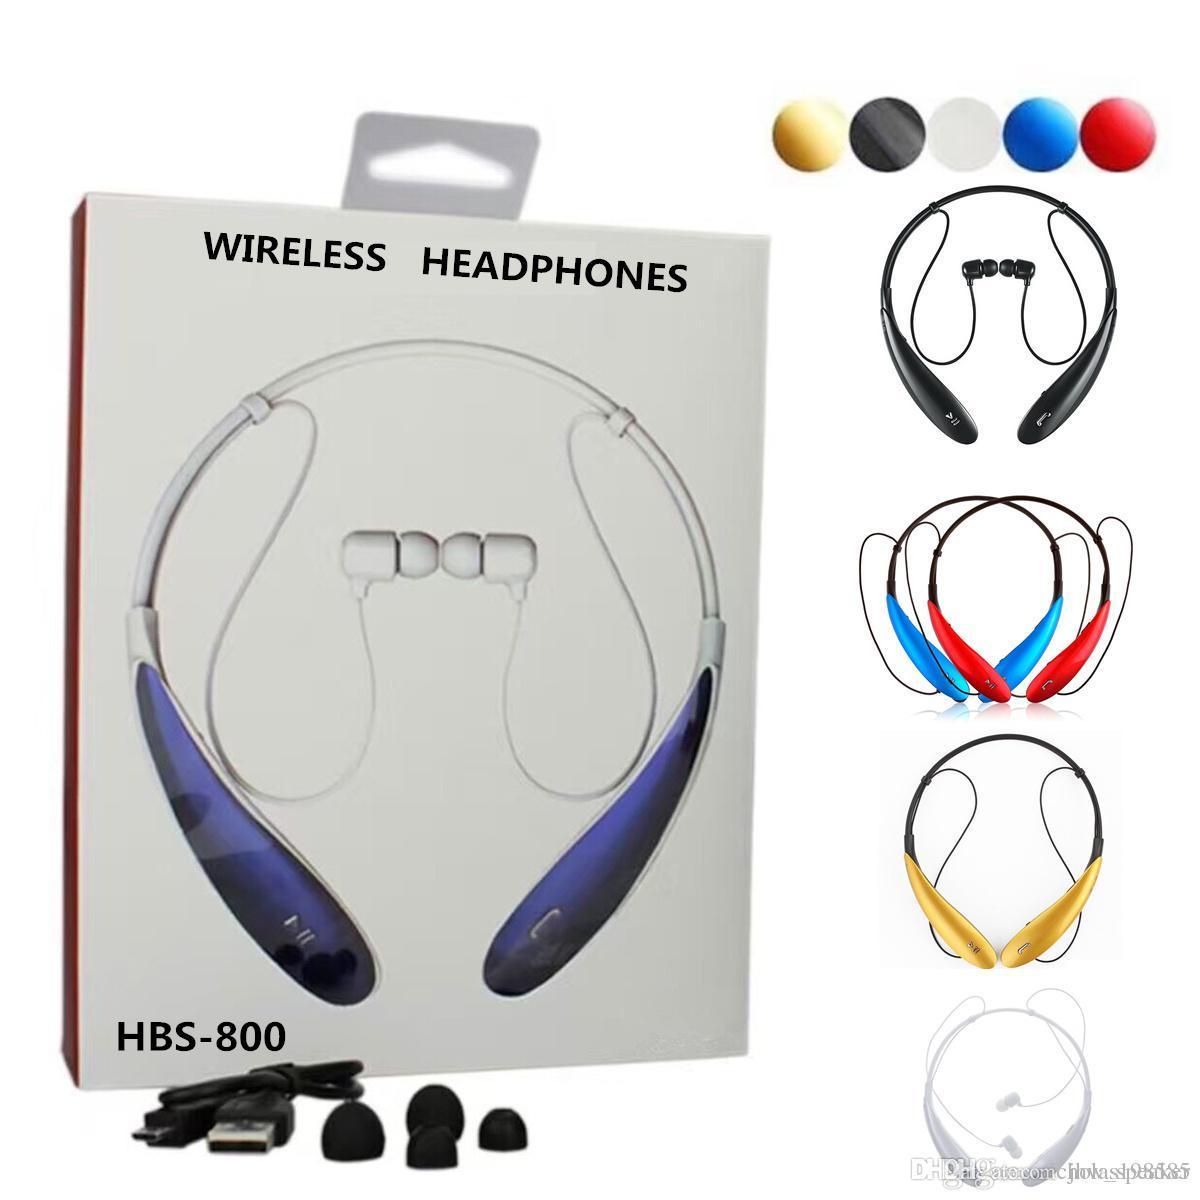 hbs 800 bluetooth headphones sport headset tone hbs800 neckband stereo wirele. Black Bedroom Furniture Sets. Home Design Ideas